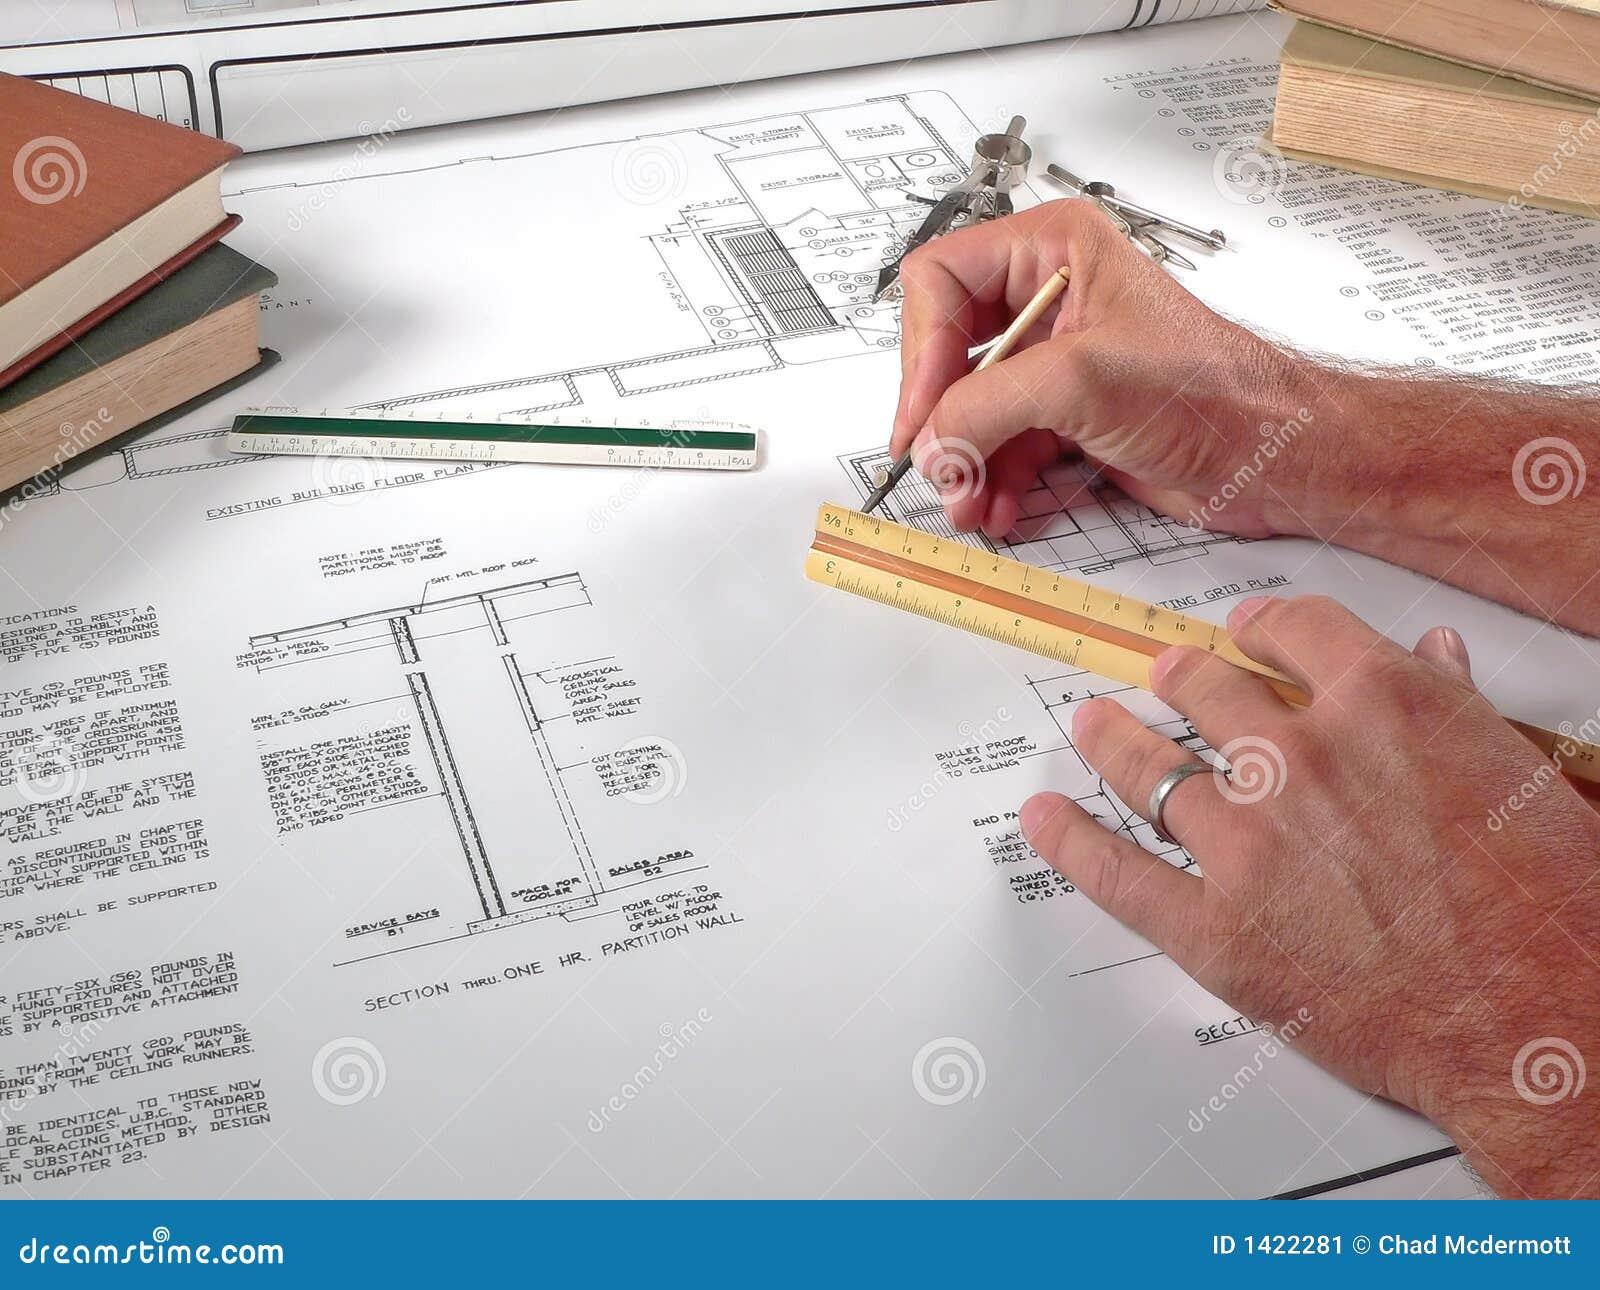 Architect 39 S Workspace Tools And Blueprints Stock Image Image 1422281